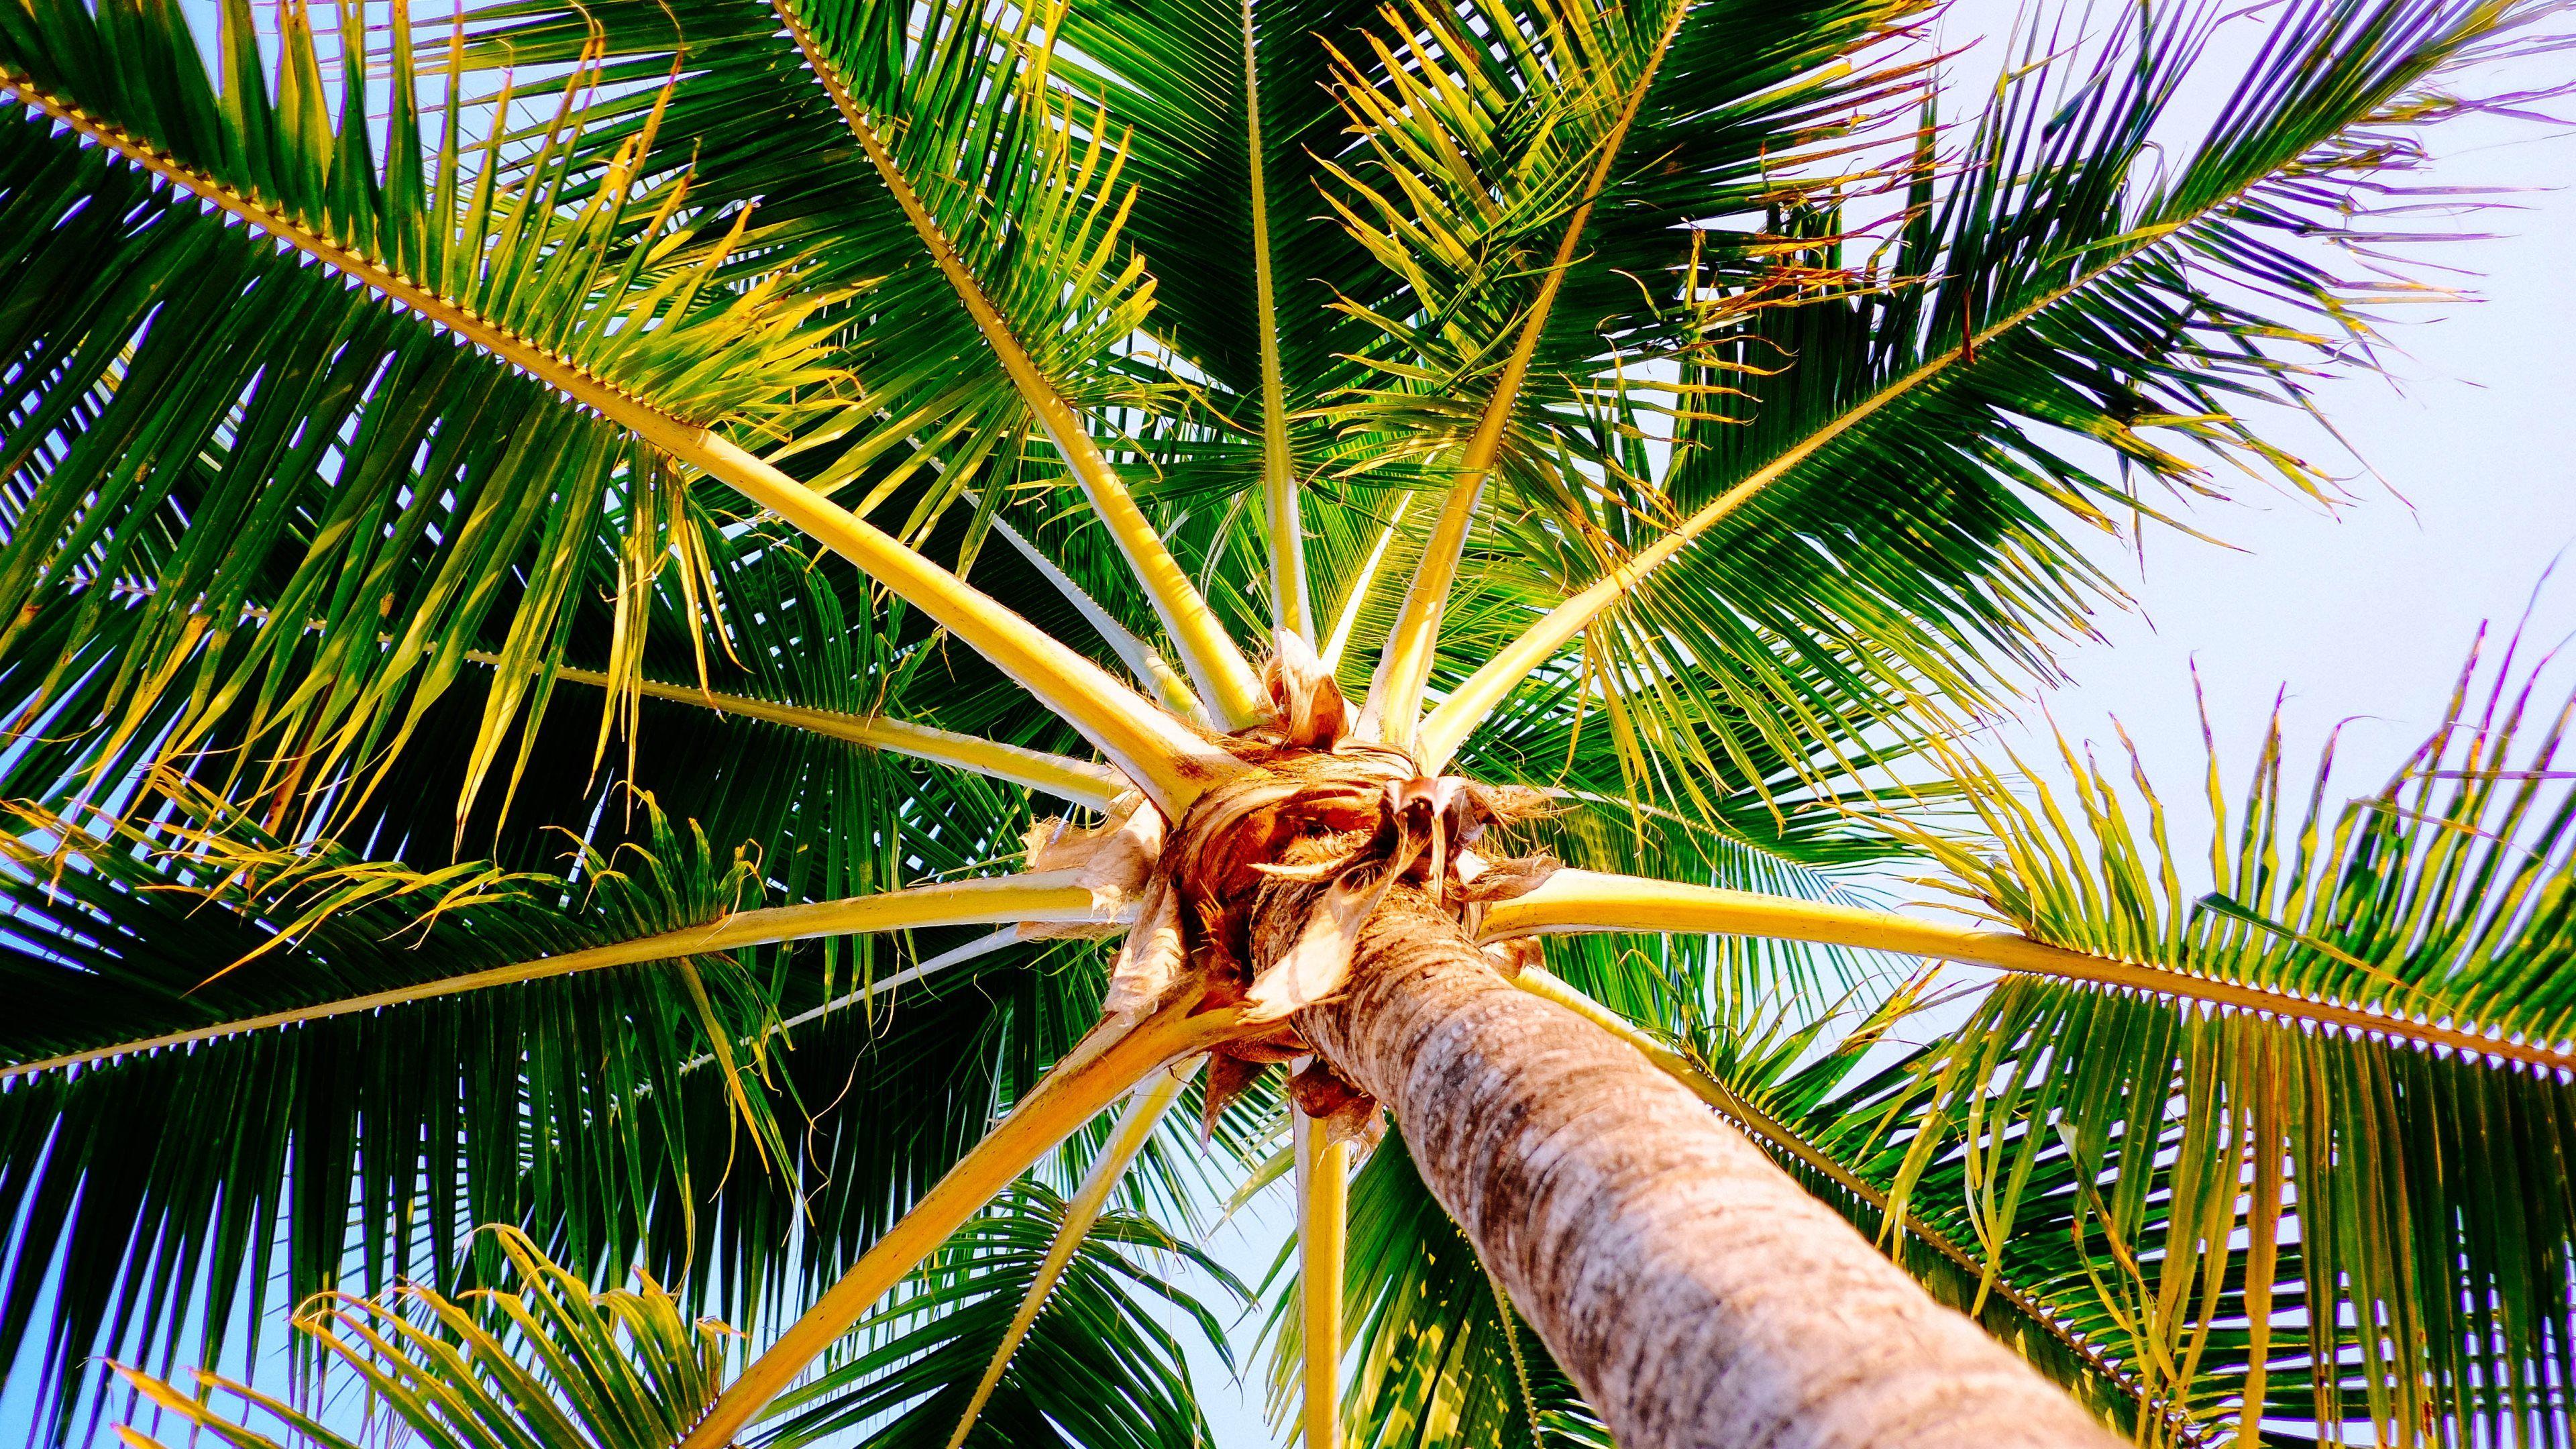 Tropical Nature In Jamaica Wallpaper Hd Wallpapers Palm Trees Wallpaper Tree Hd Wallpaper Tree Wallpaper